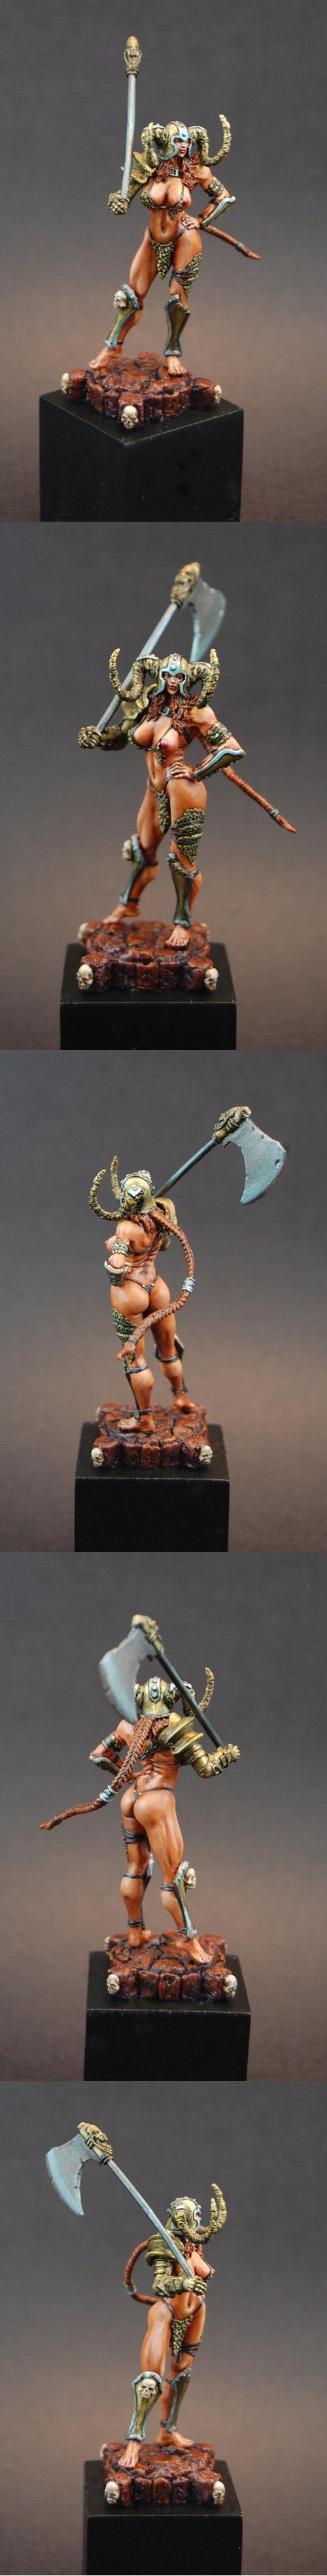 Axe, Kabuki Models, Nude, Warhammer Fantasy, Warriors